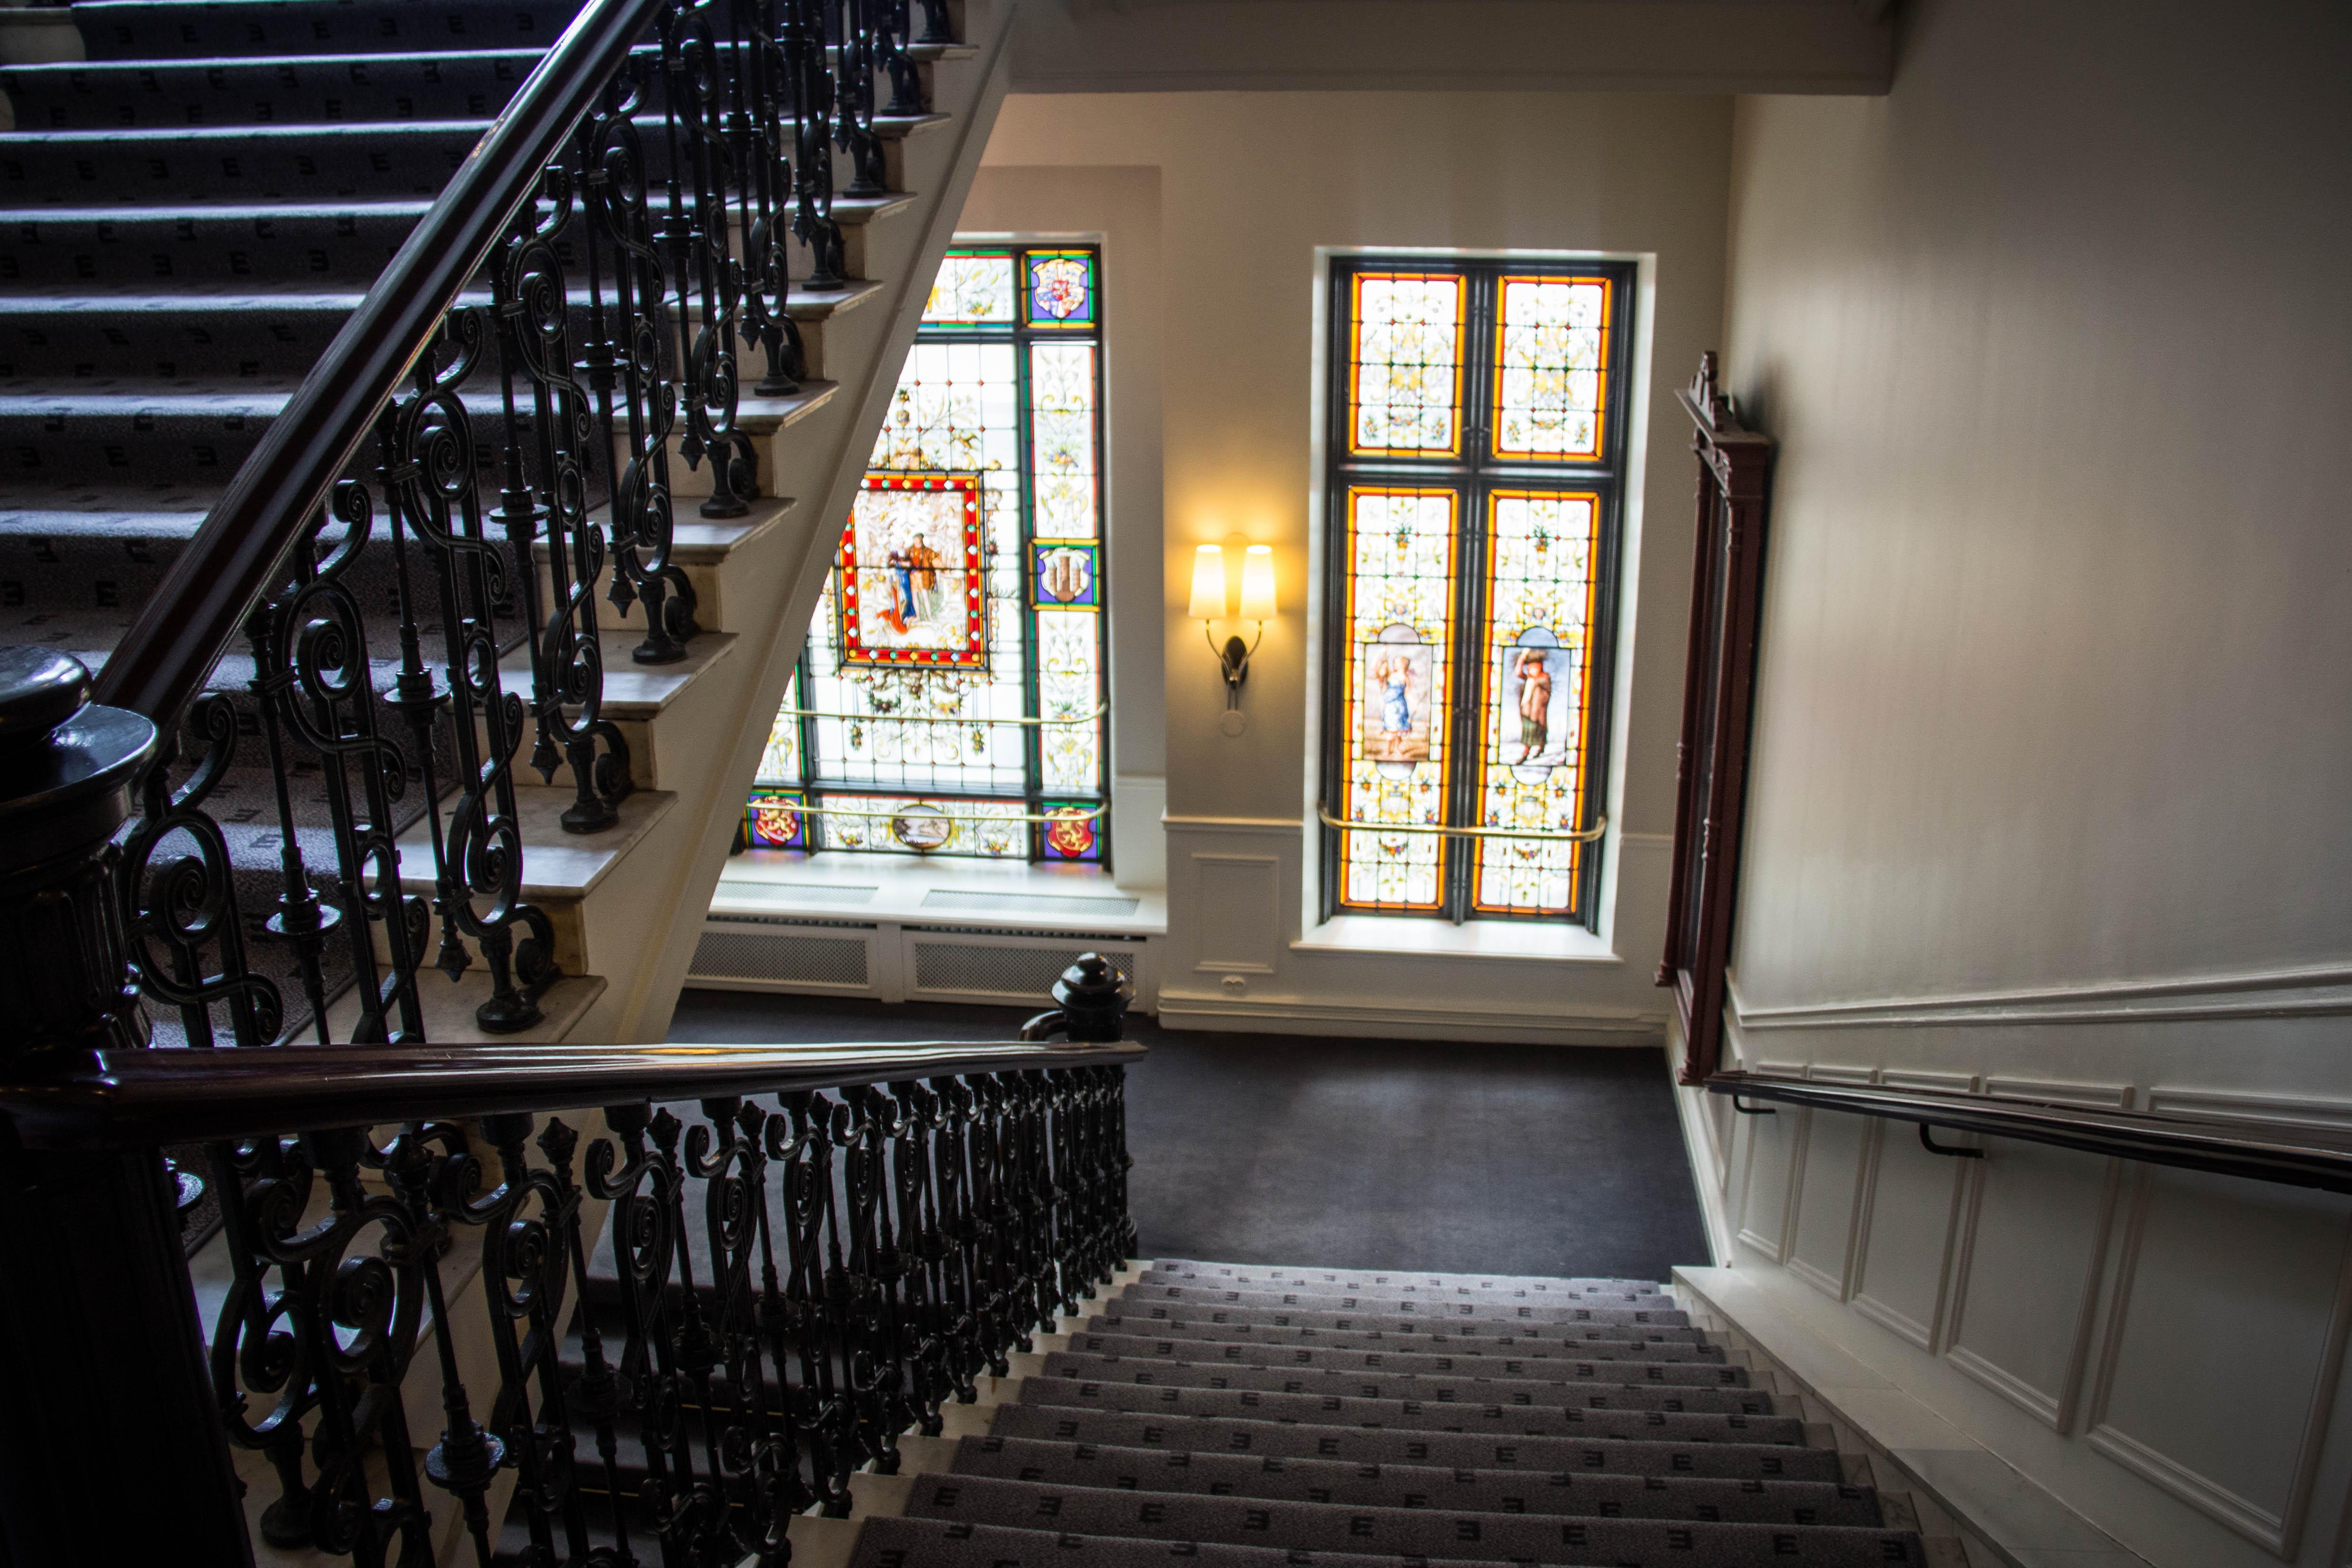 Fondos de pantalla arquitectura edificio biblioteca for Iluminacion escaleras interiores